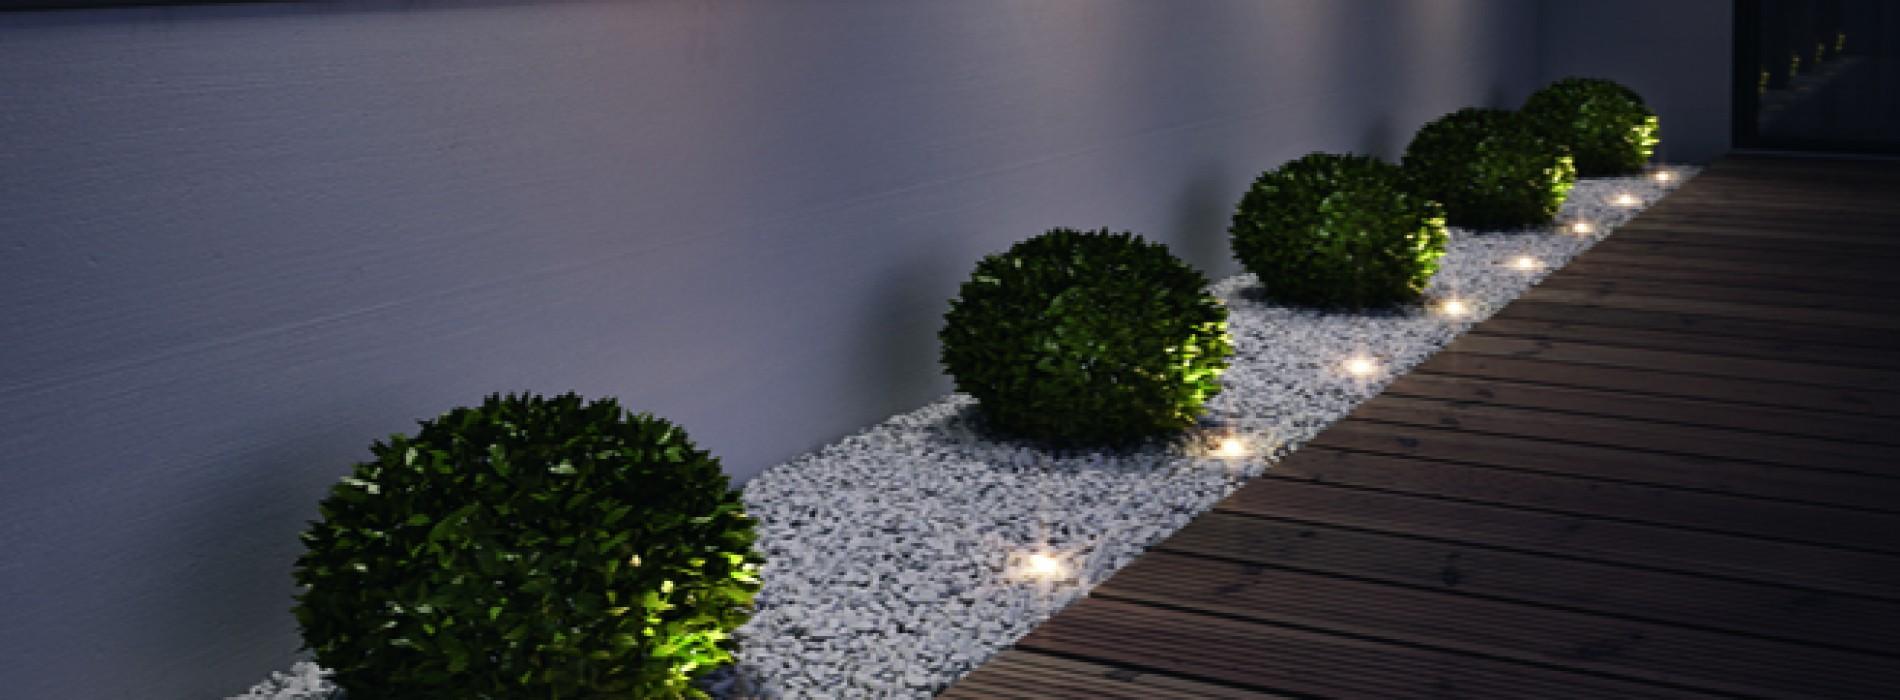 Iluminacion Led Exterior Jardin Good Iluminacin Con